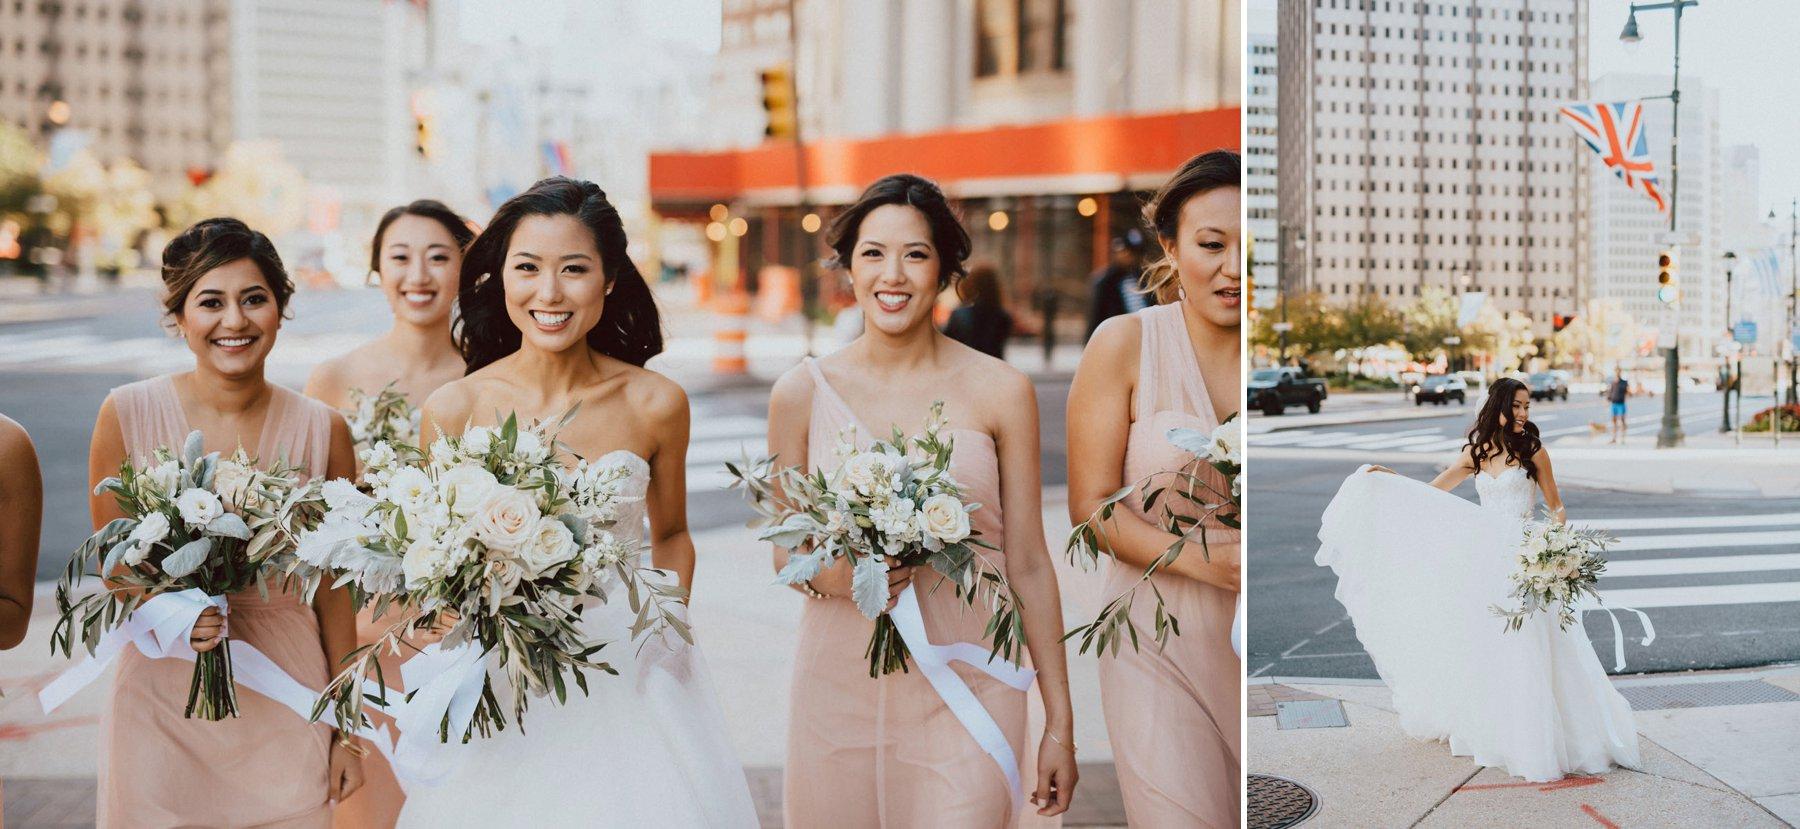 philadelphia-wedding-photographer-28.jpg